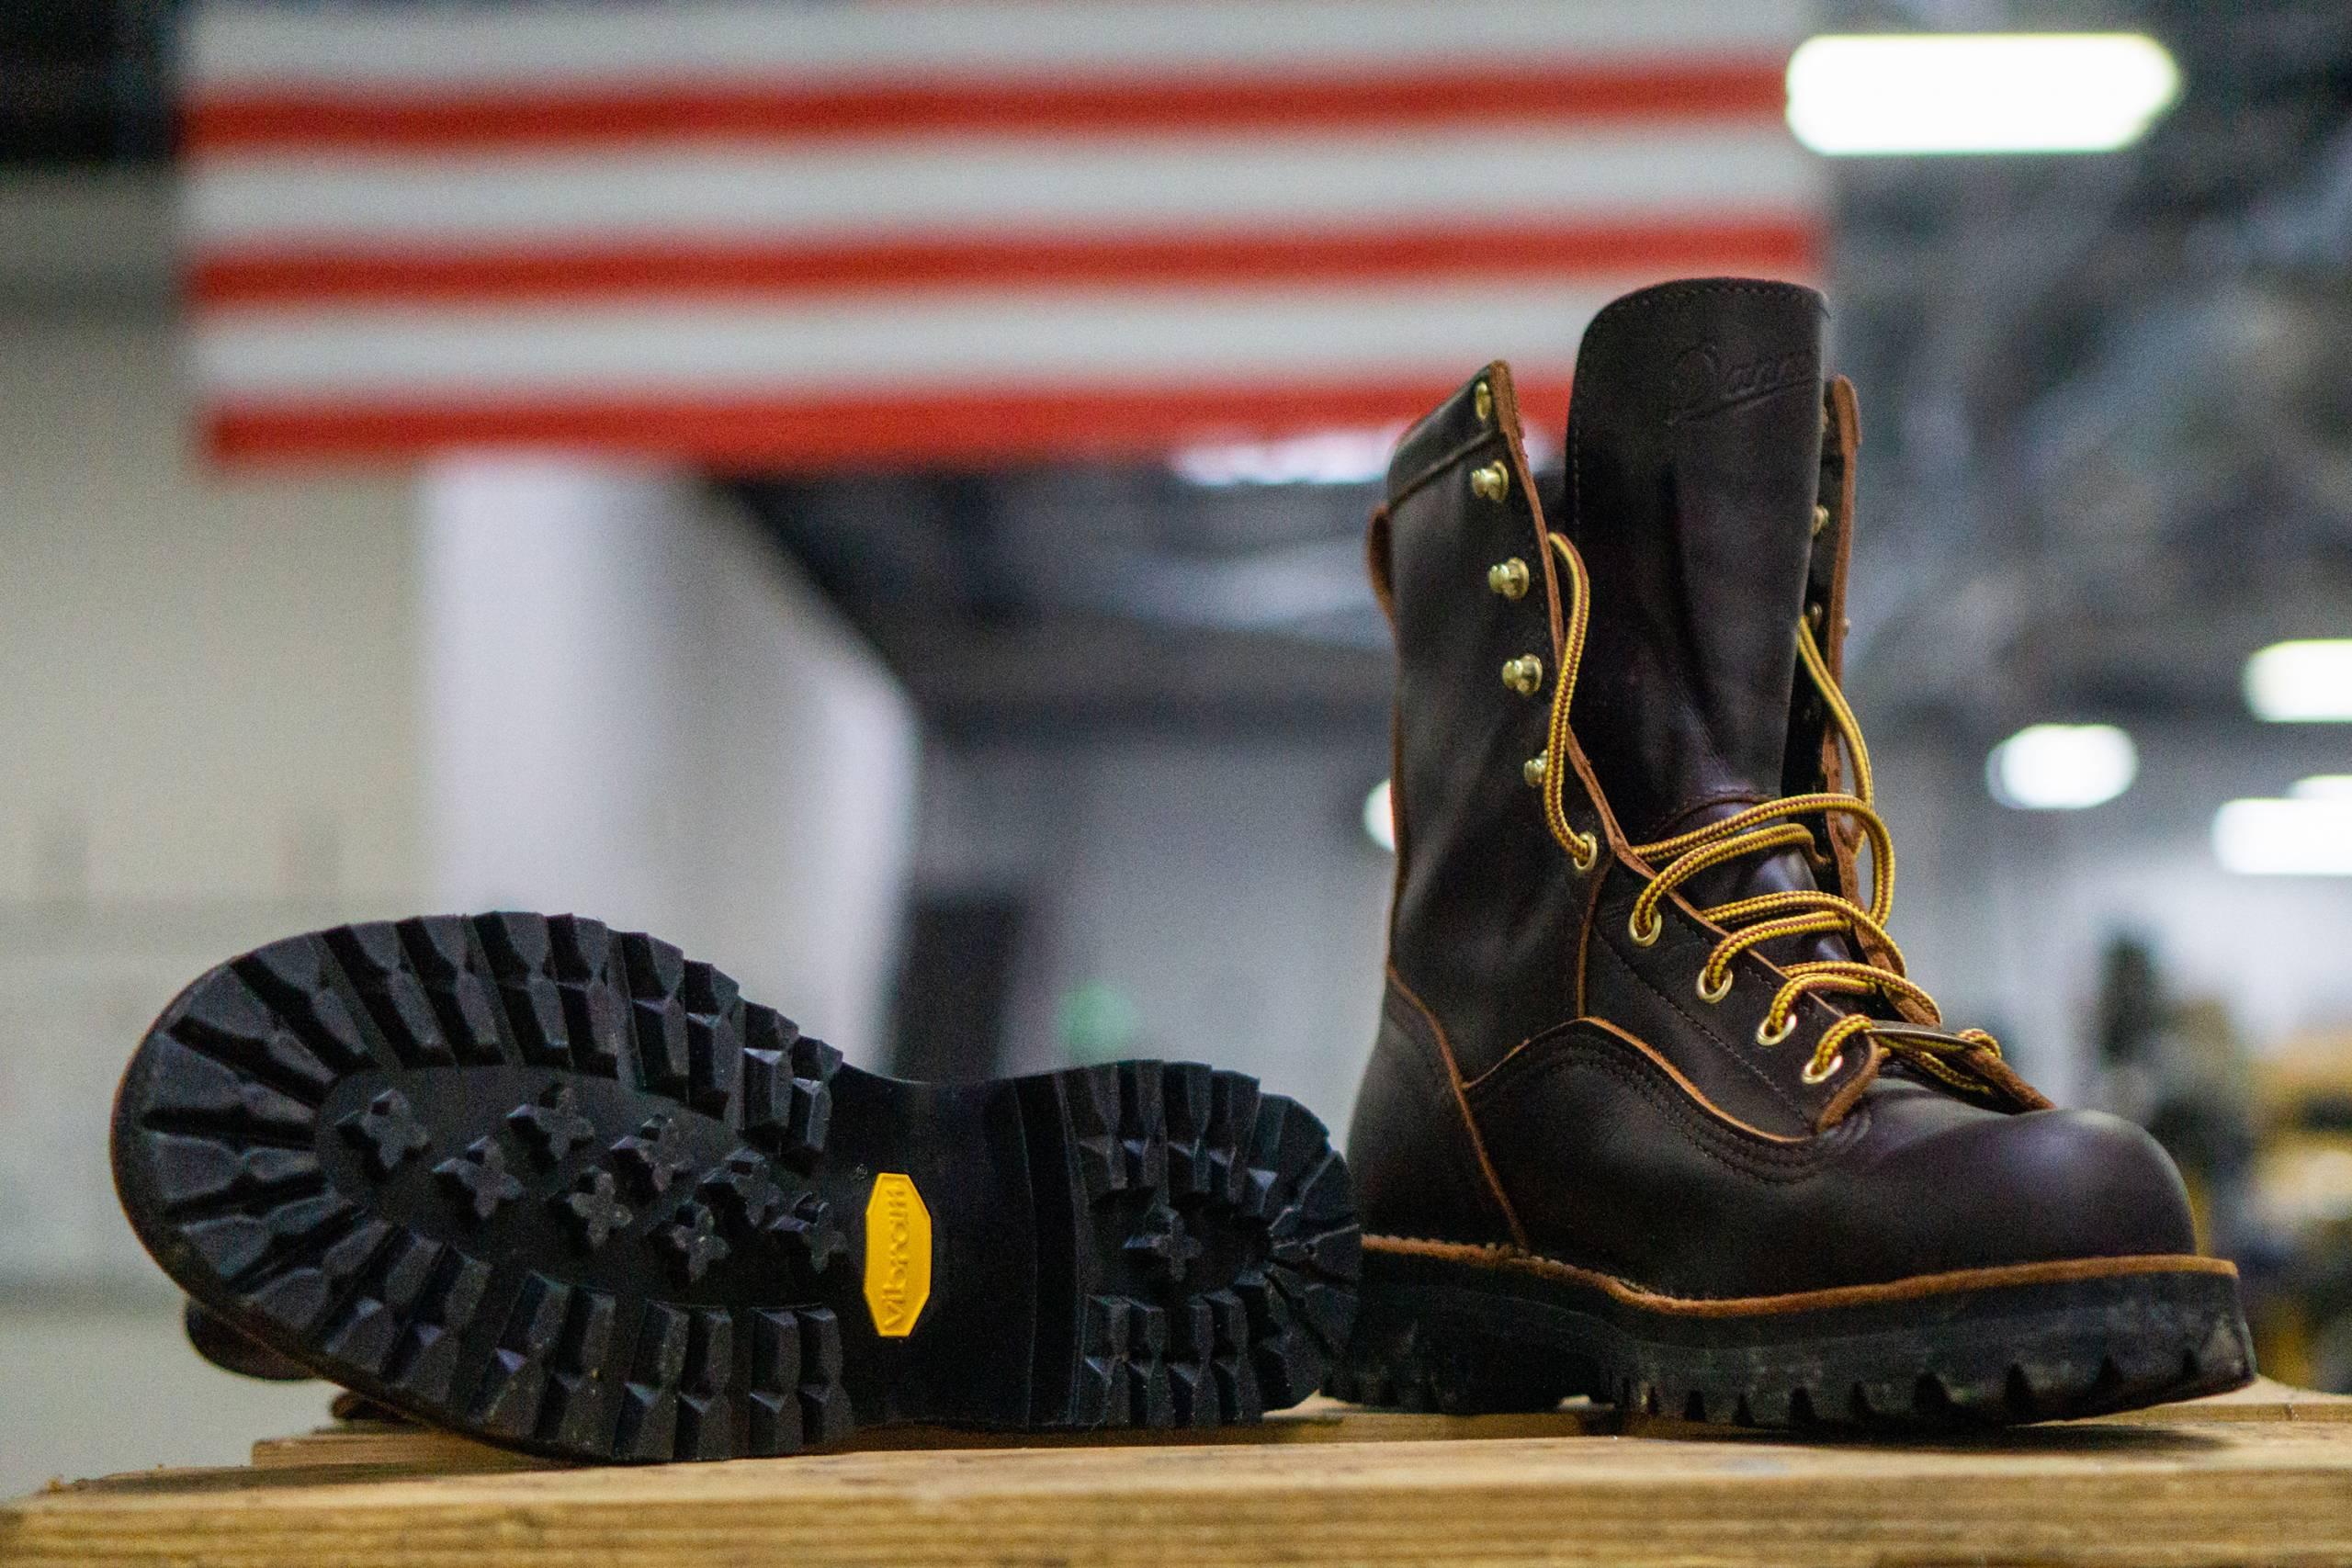 Danner Rain Forest boots